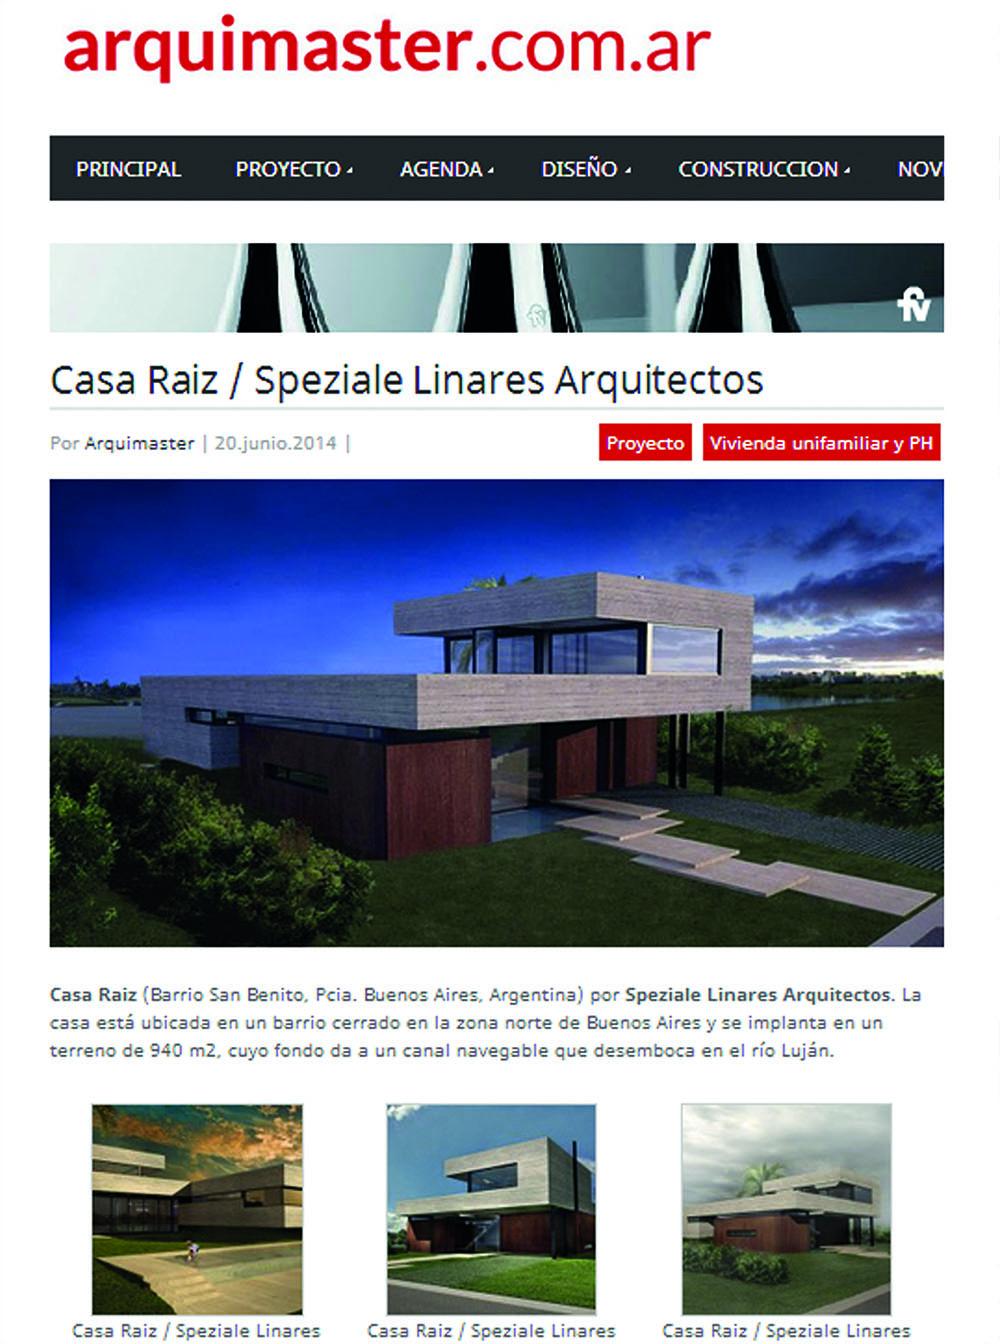 ARQUIMASTER - CASA RAIZ